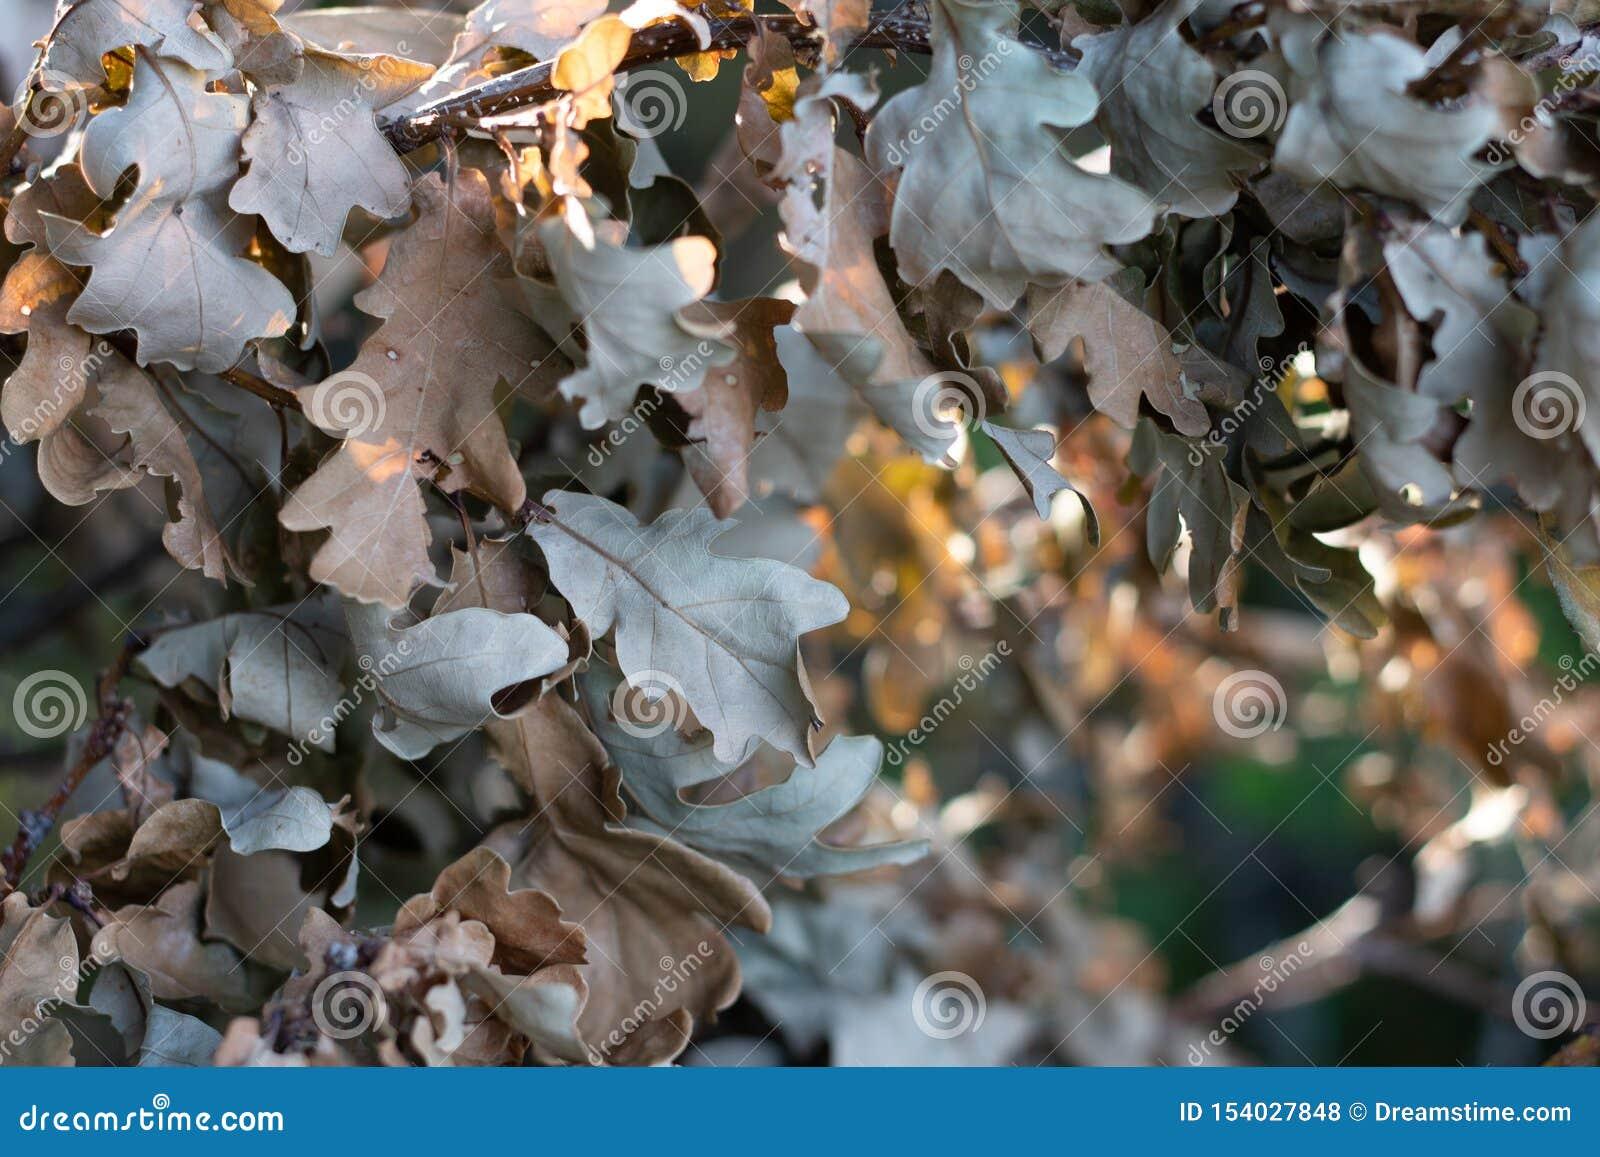 Leaves dry autumn